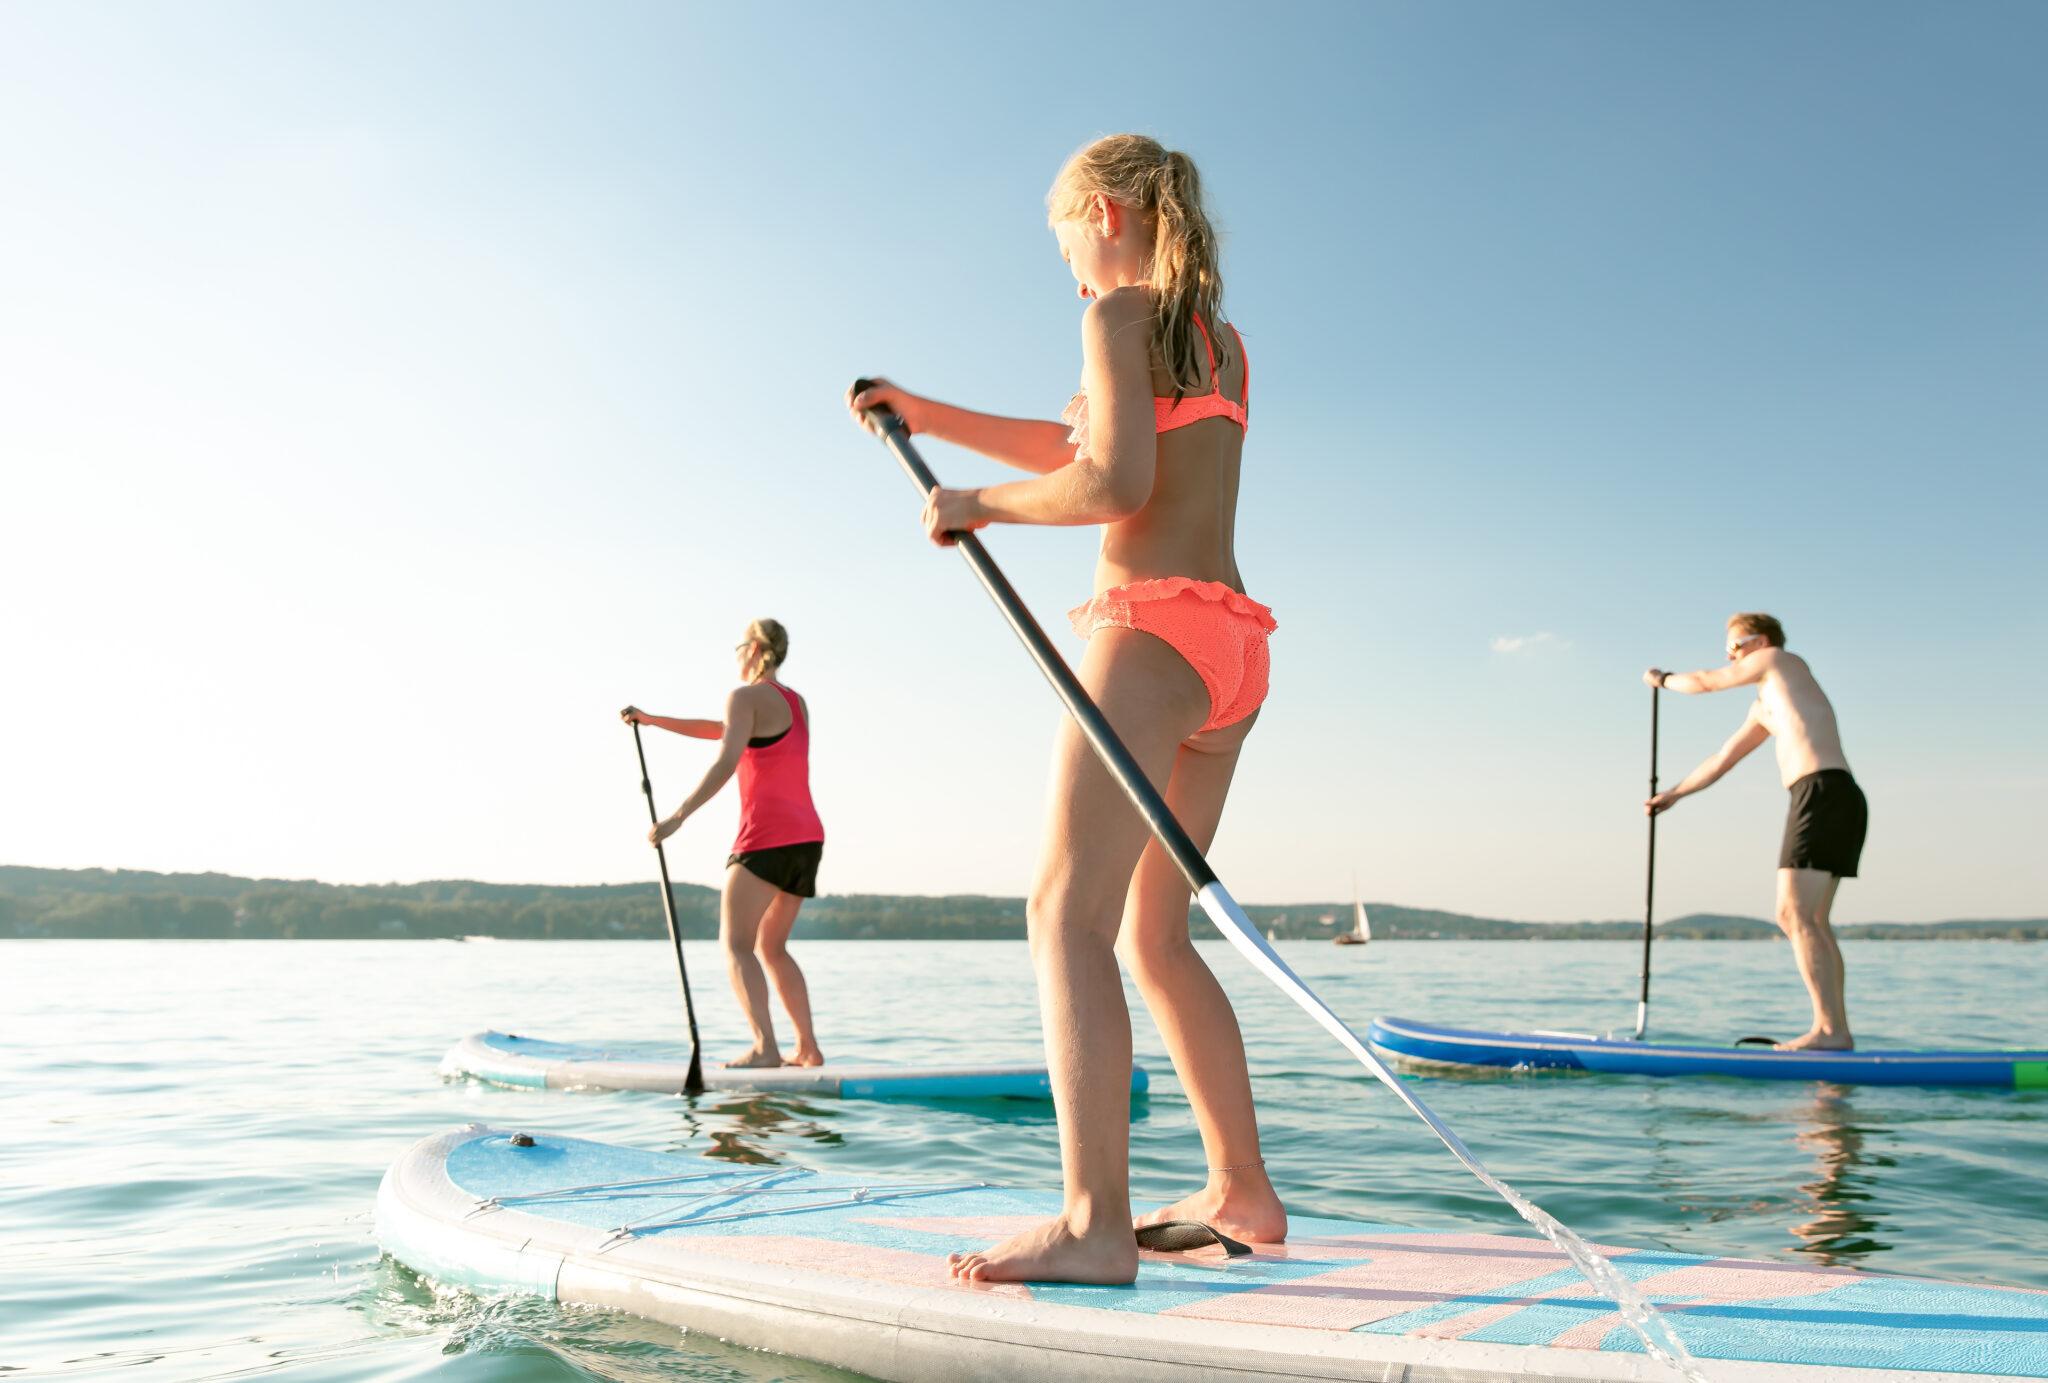 Bien Choisir Sa Planche De Stand Up Paddle Finistere2 9